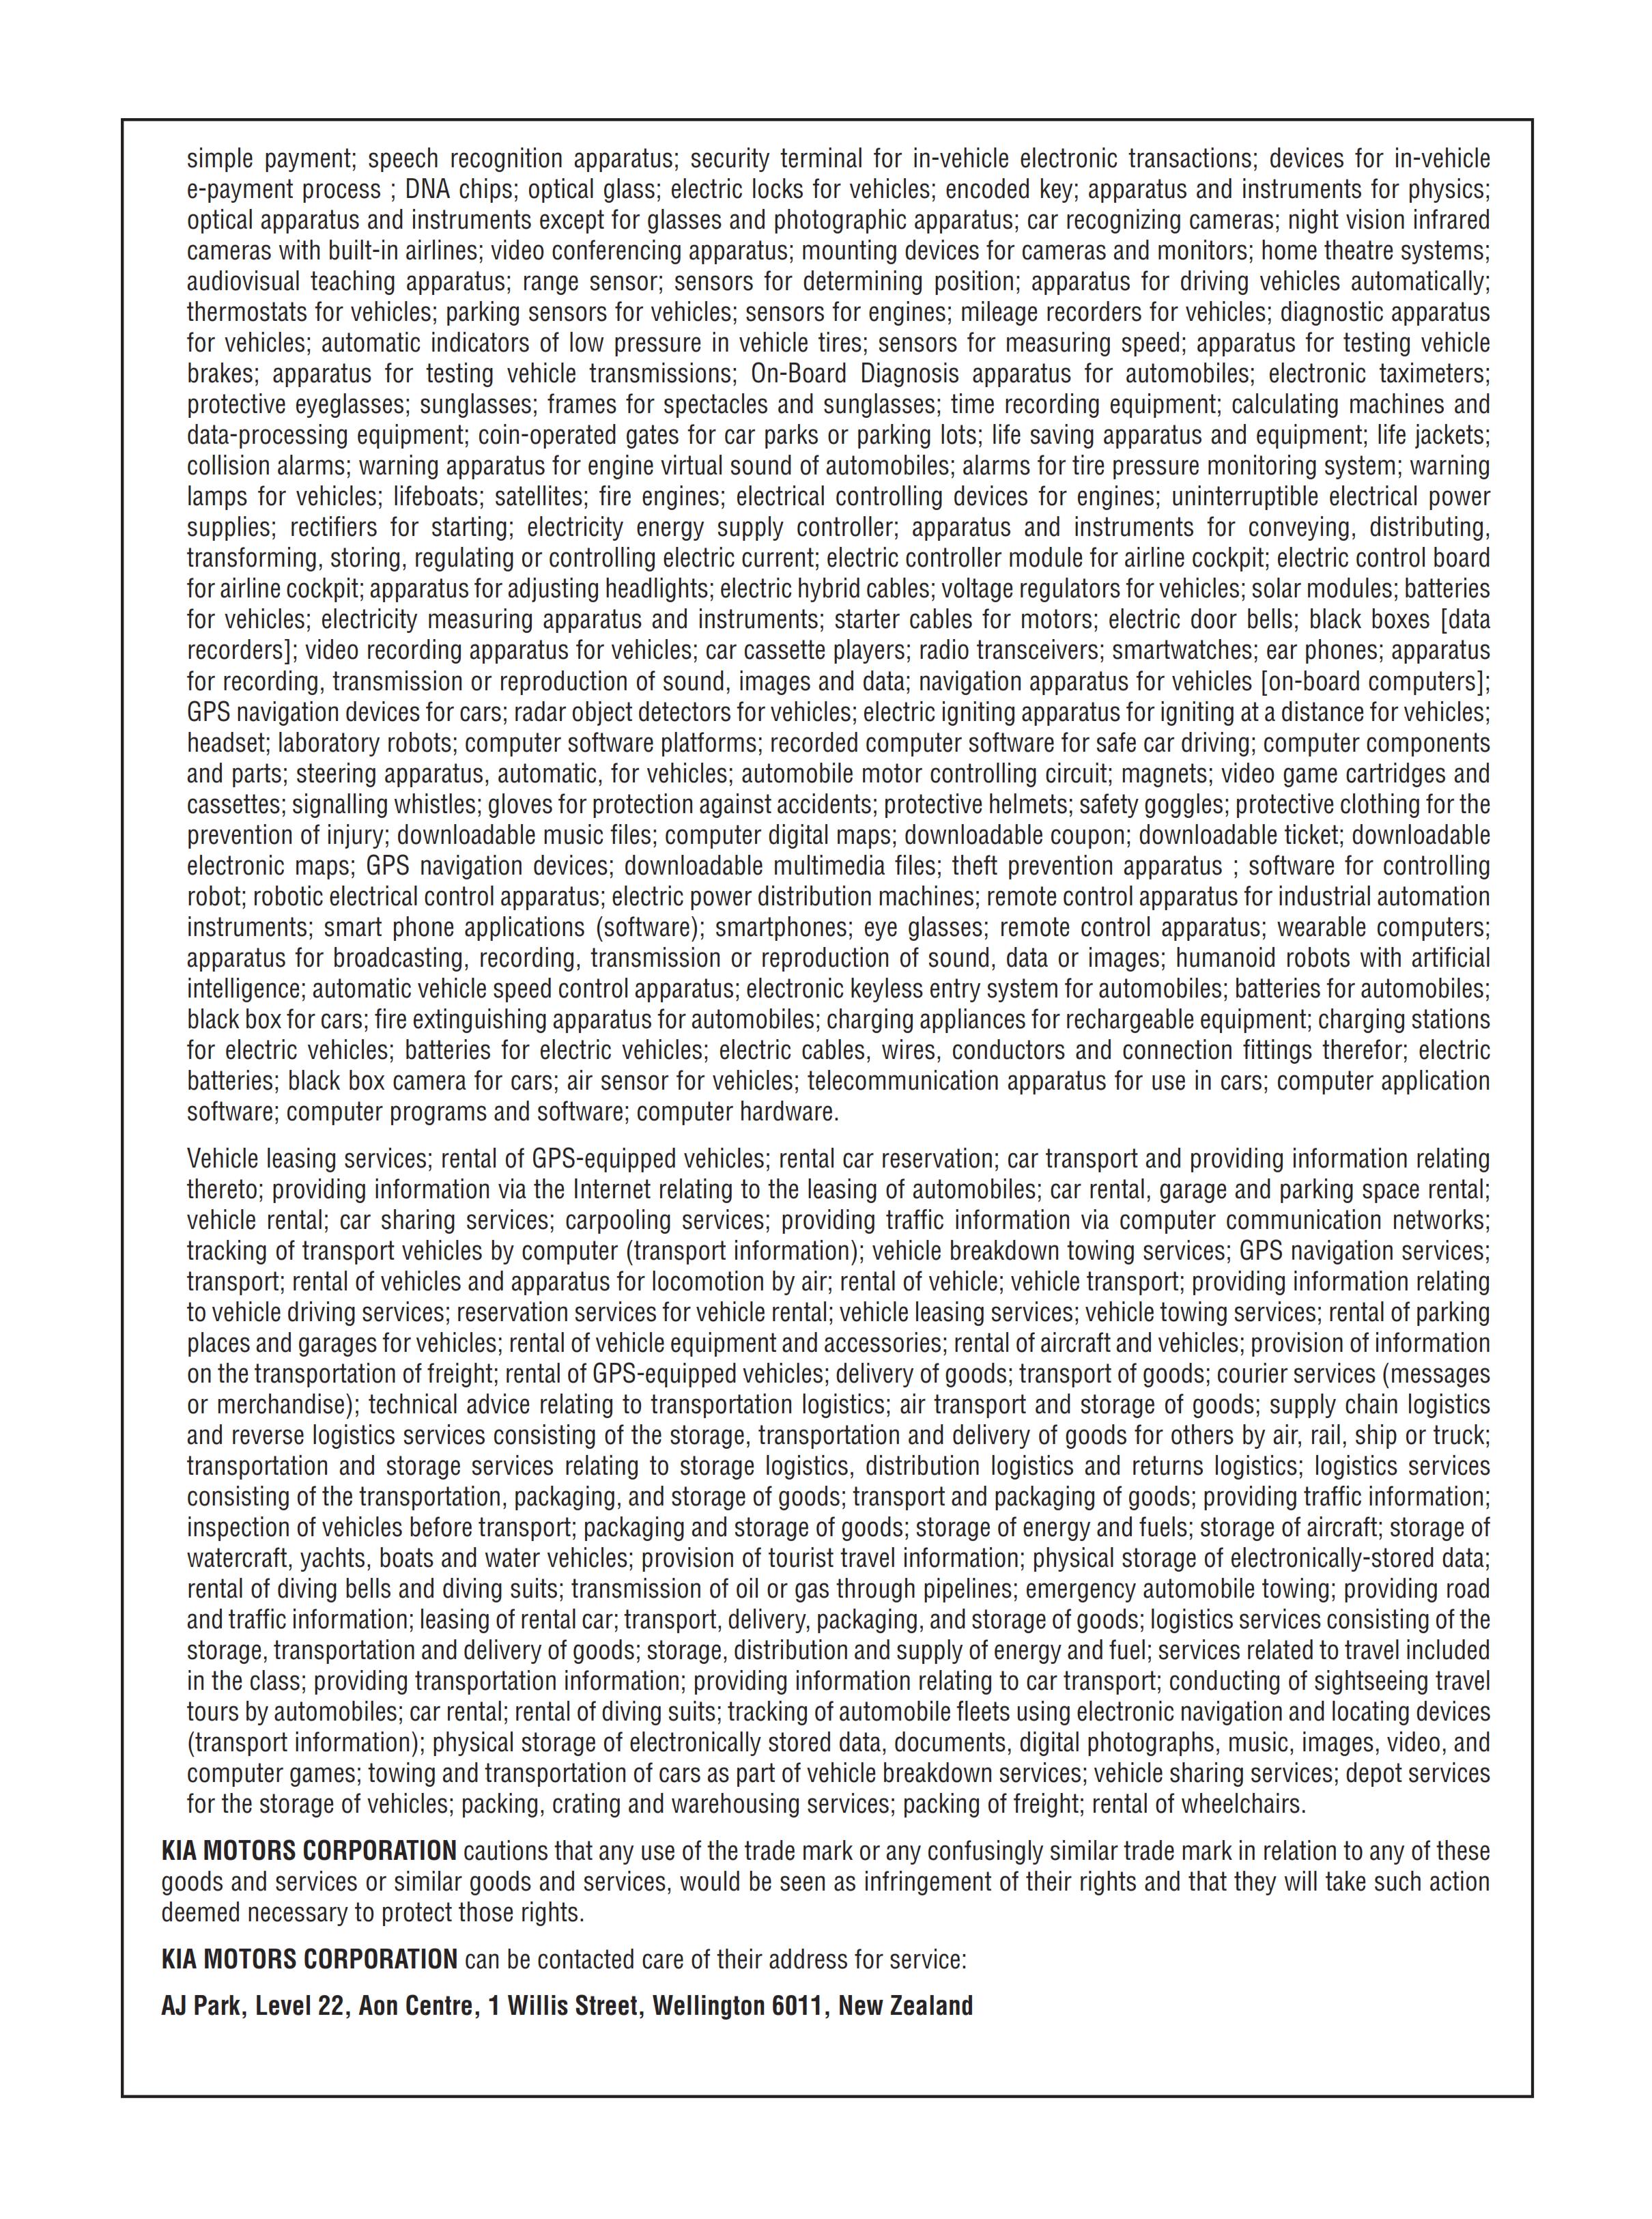 Cautionary Notice KIA ref 88772 2 f pg Jan 2021 002